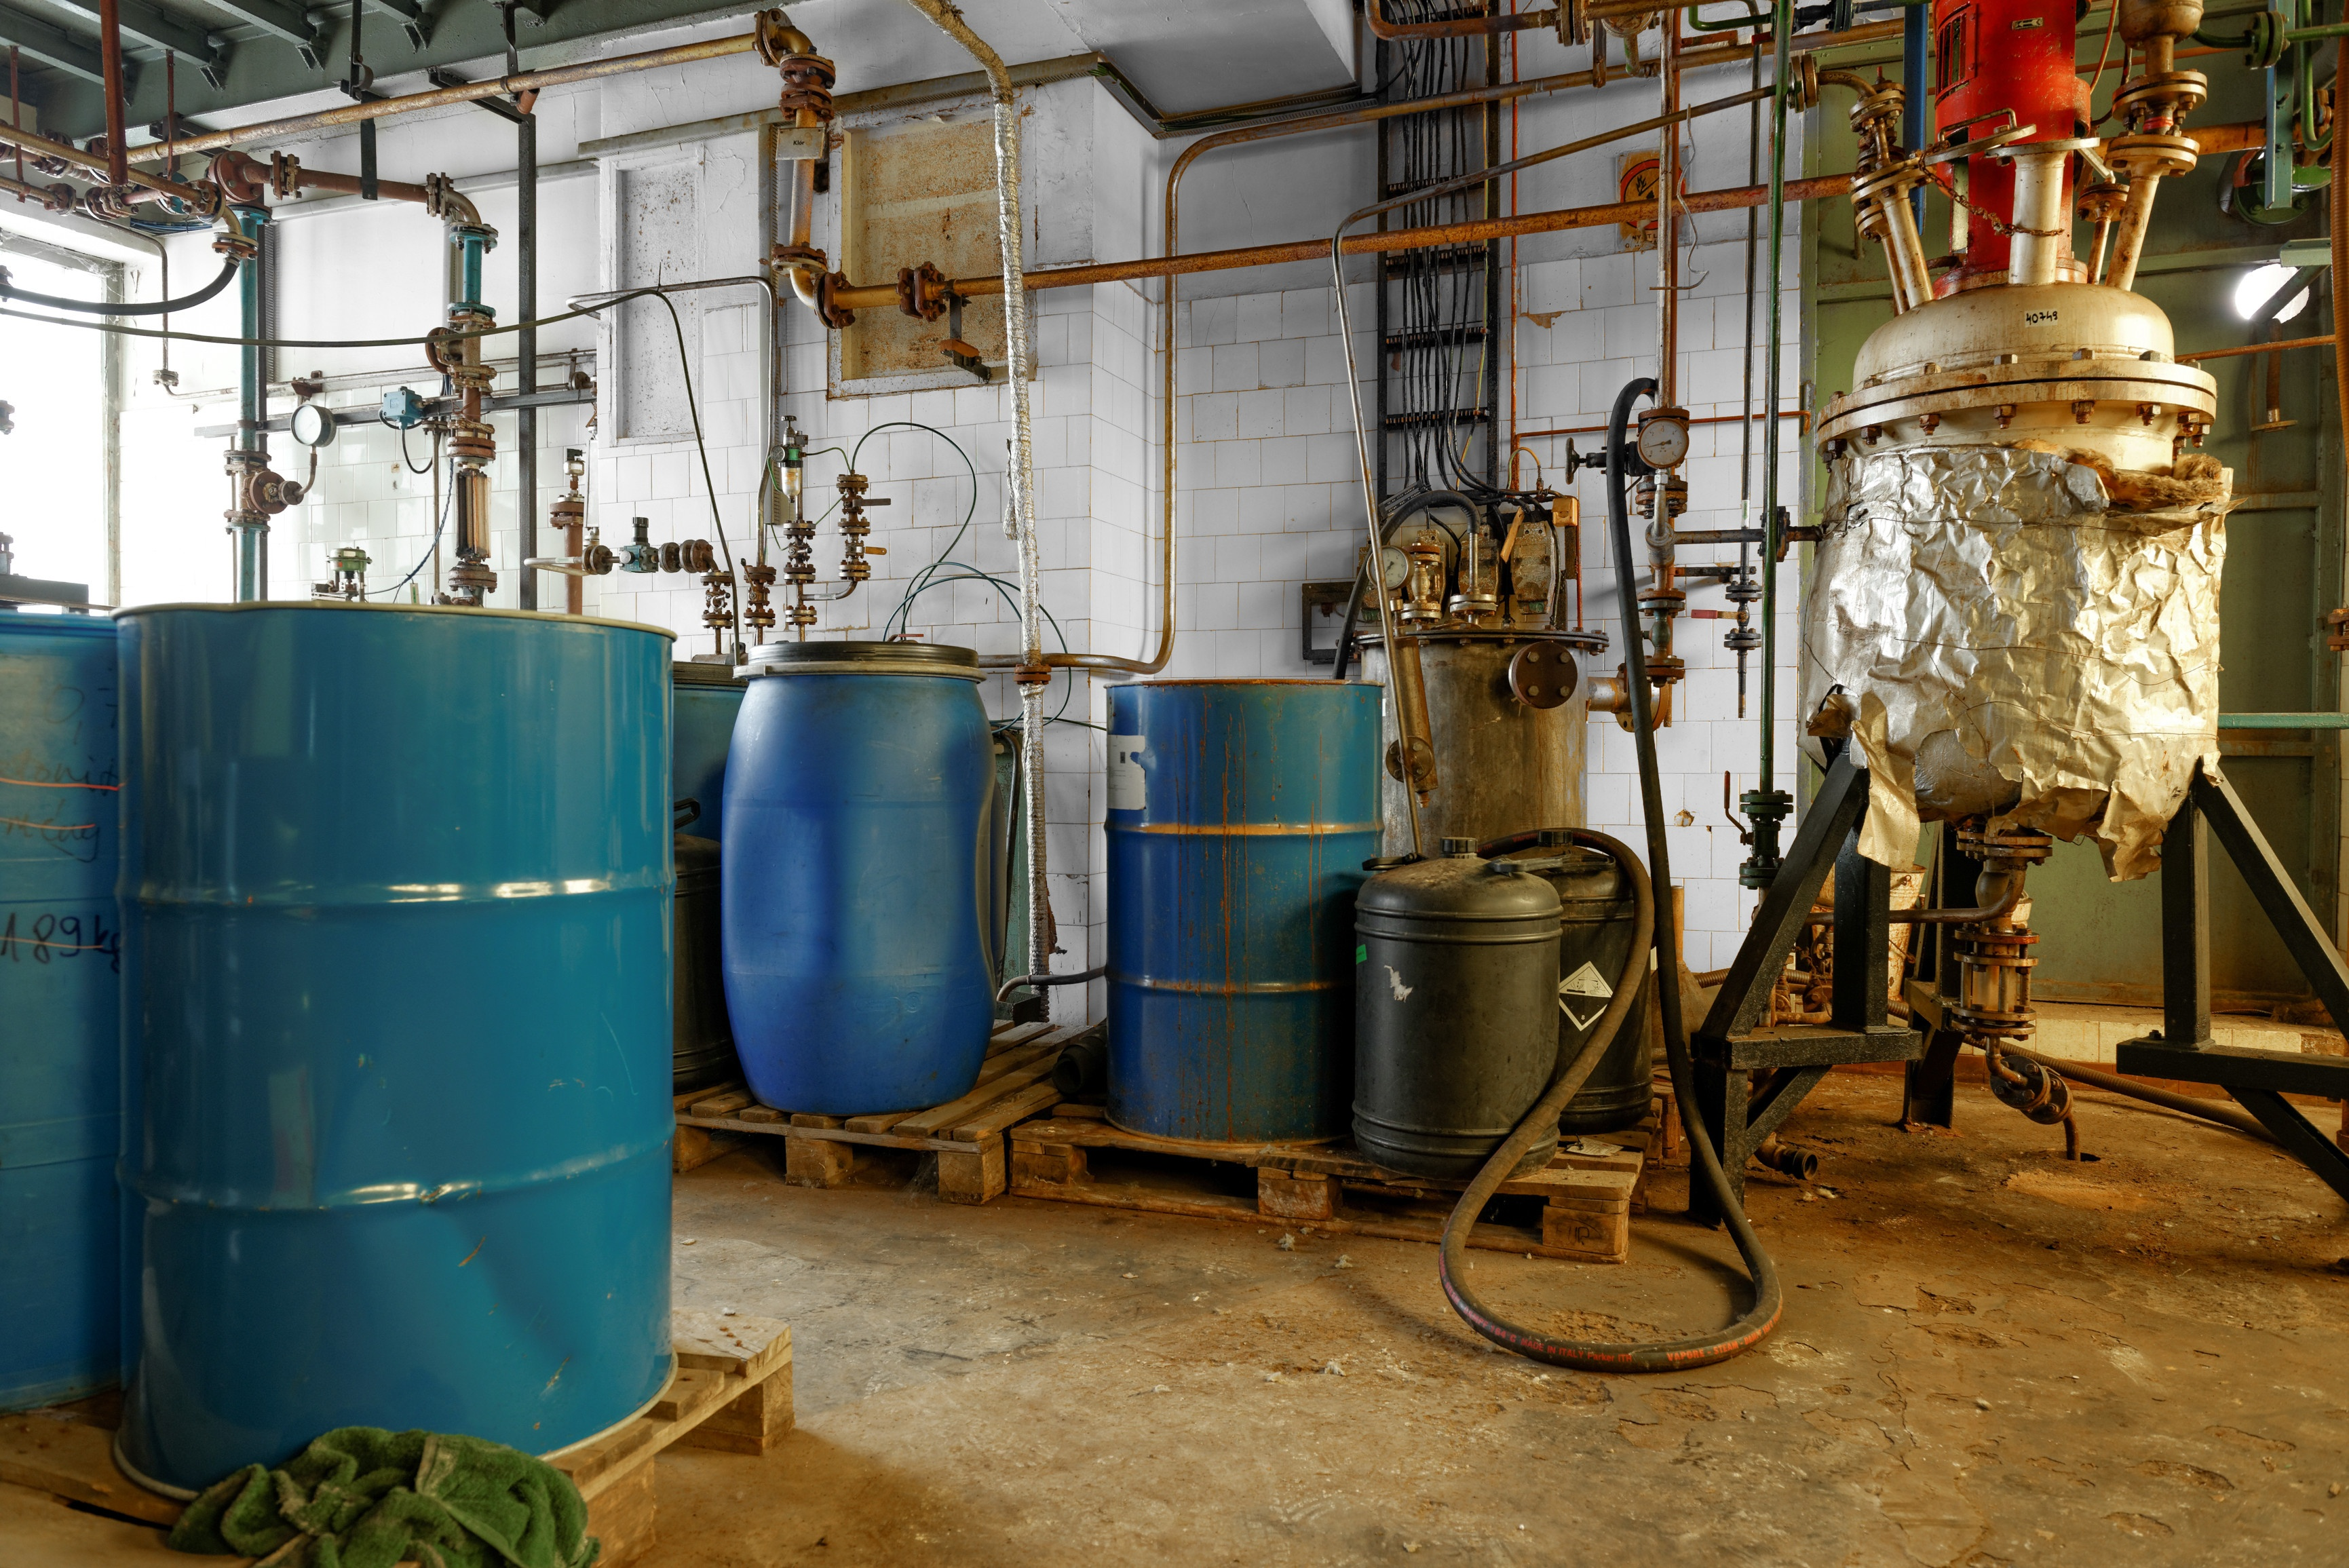 chemical waste dump